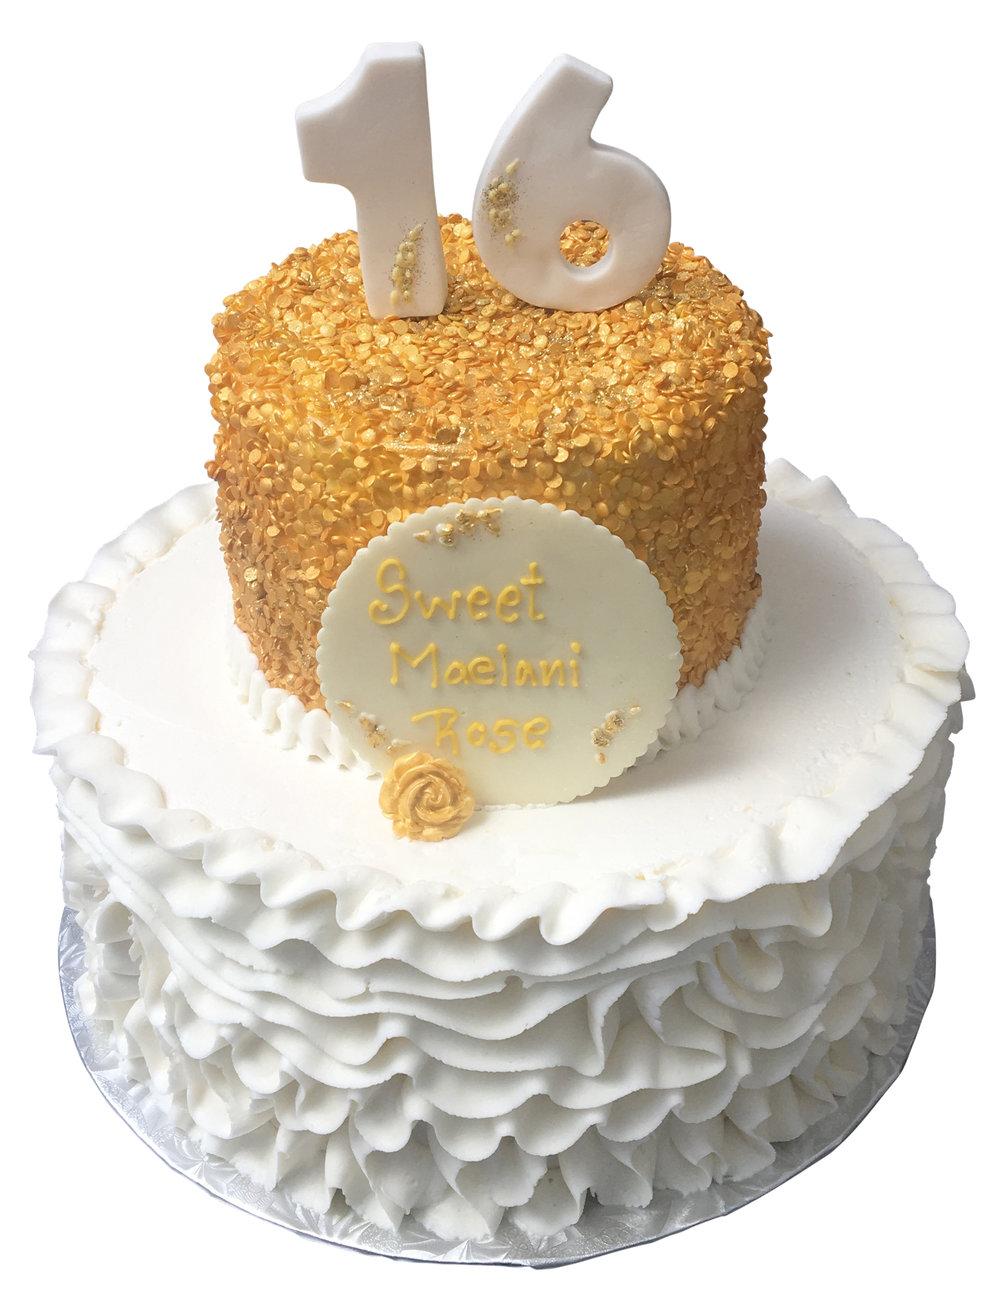 BeBe-Cakes-Gold-and-White-Cake.jpg